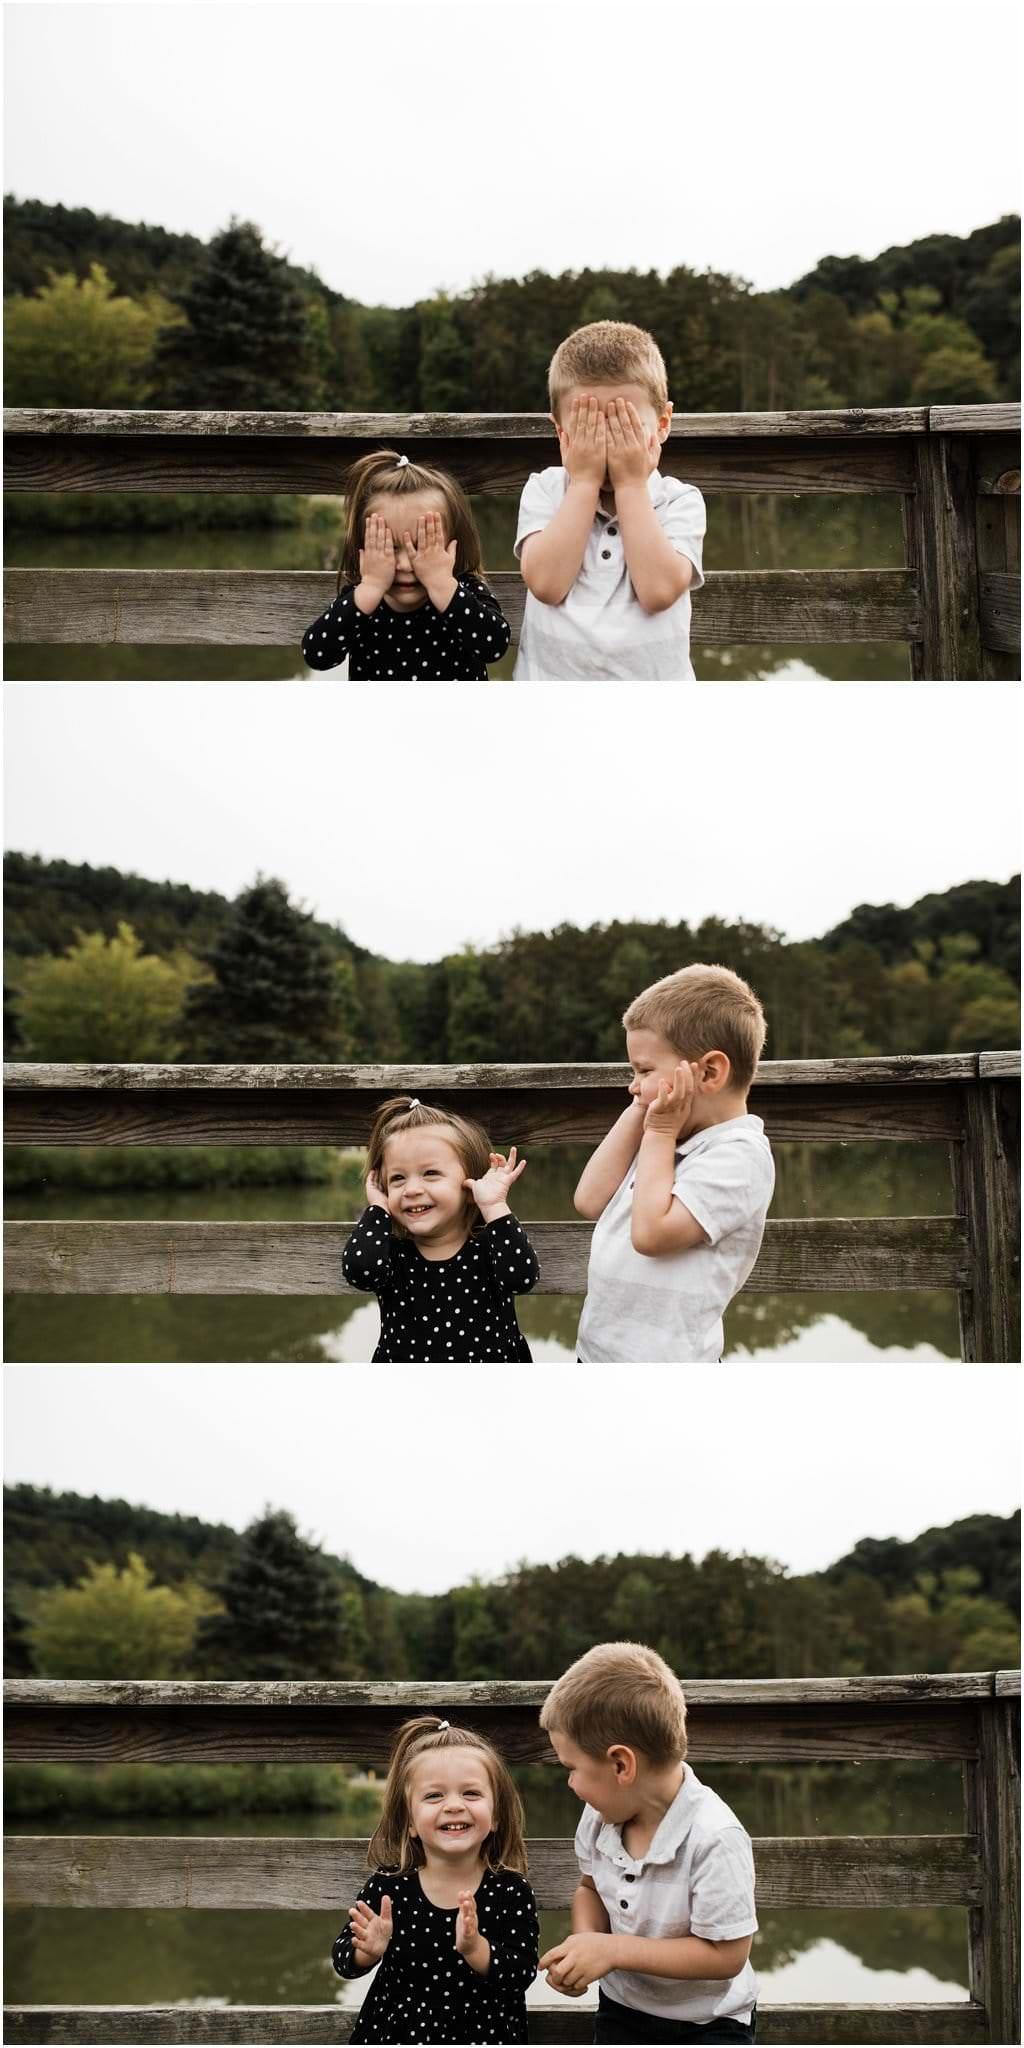 photos of siblings playing peek-a-boo